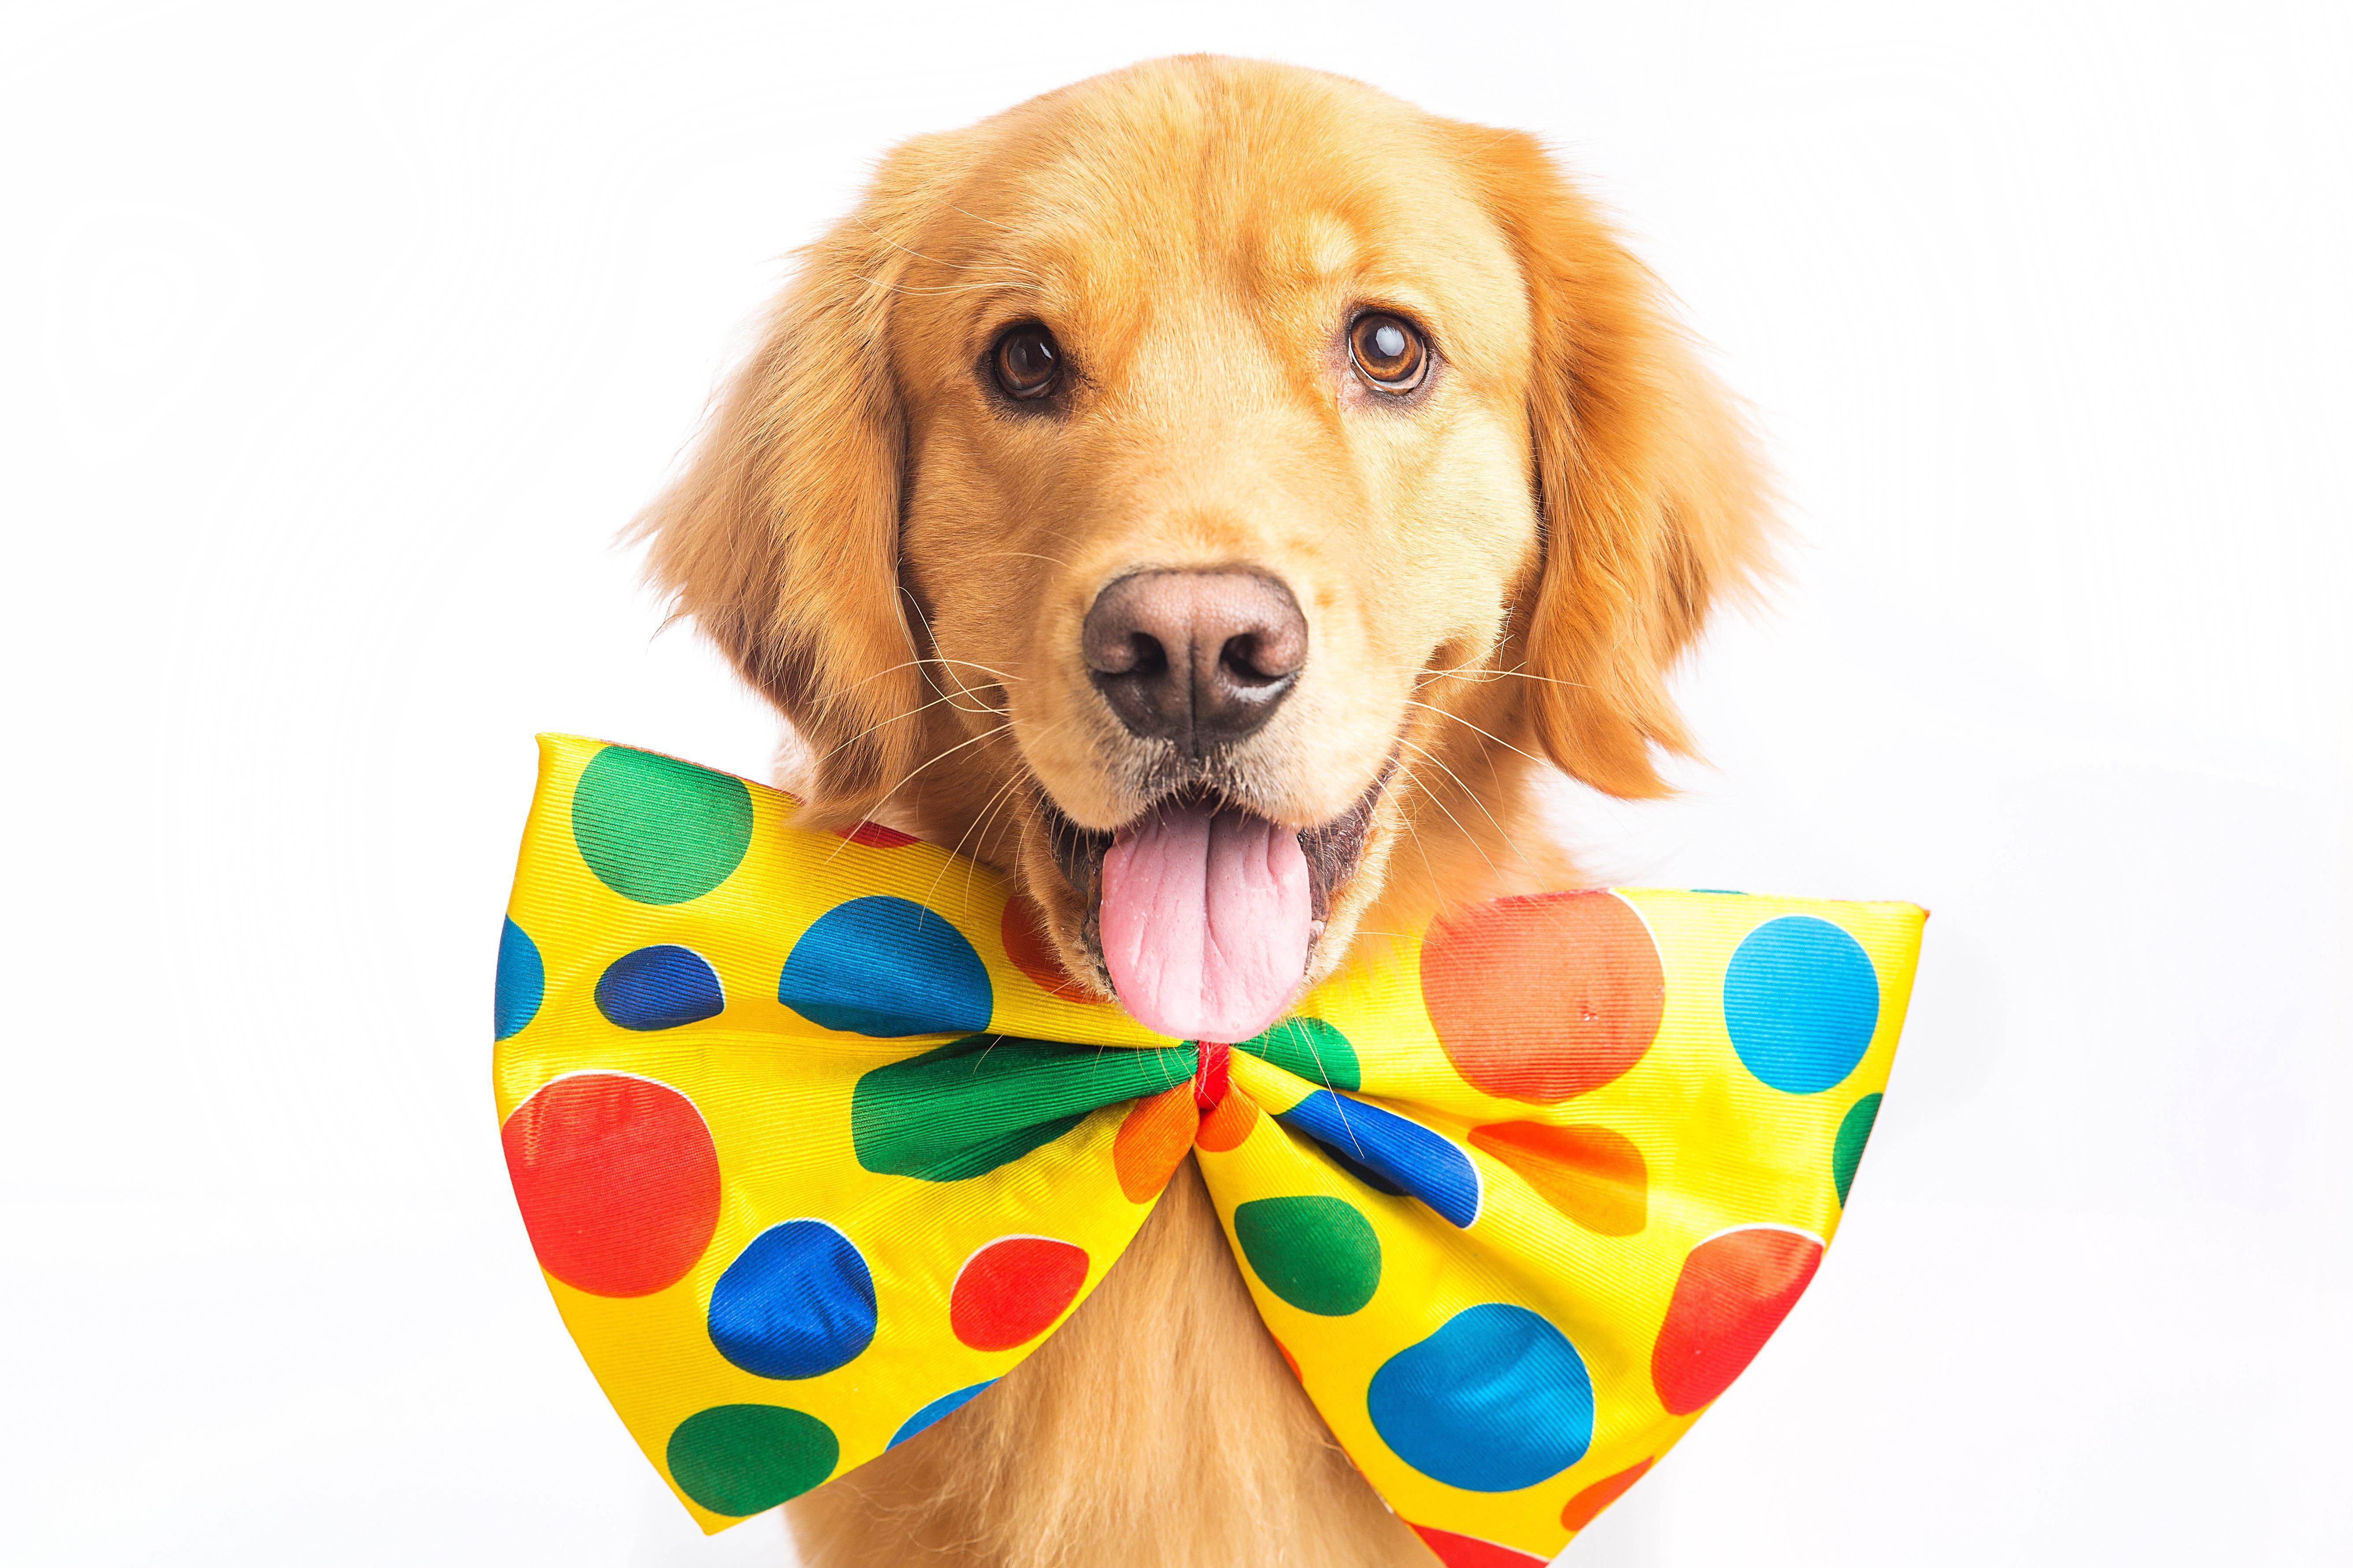 Marietta Doggy Daycare - Marietta, GA - Business Page - photo#42